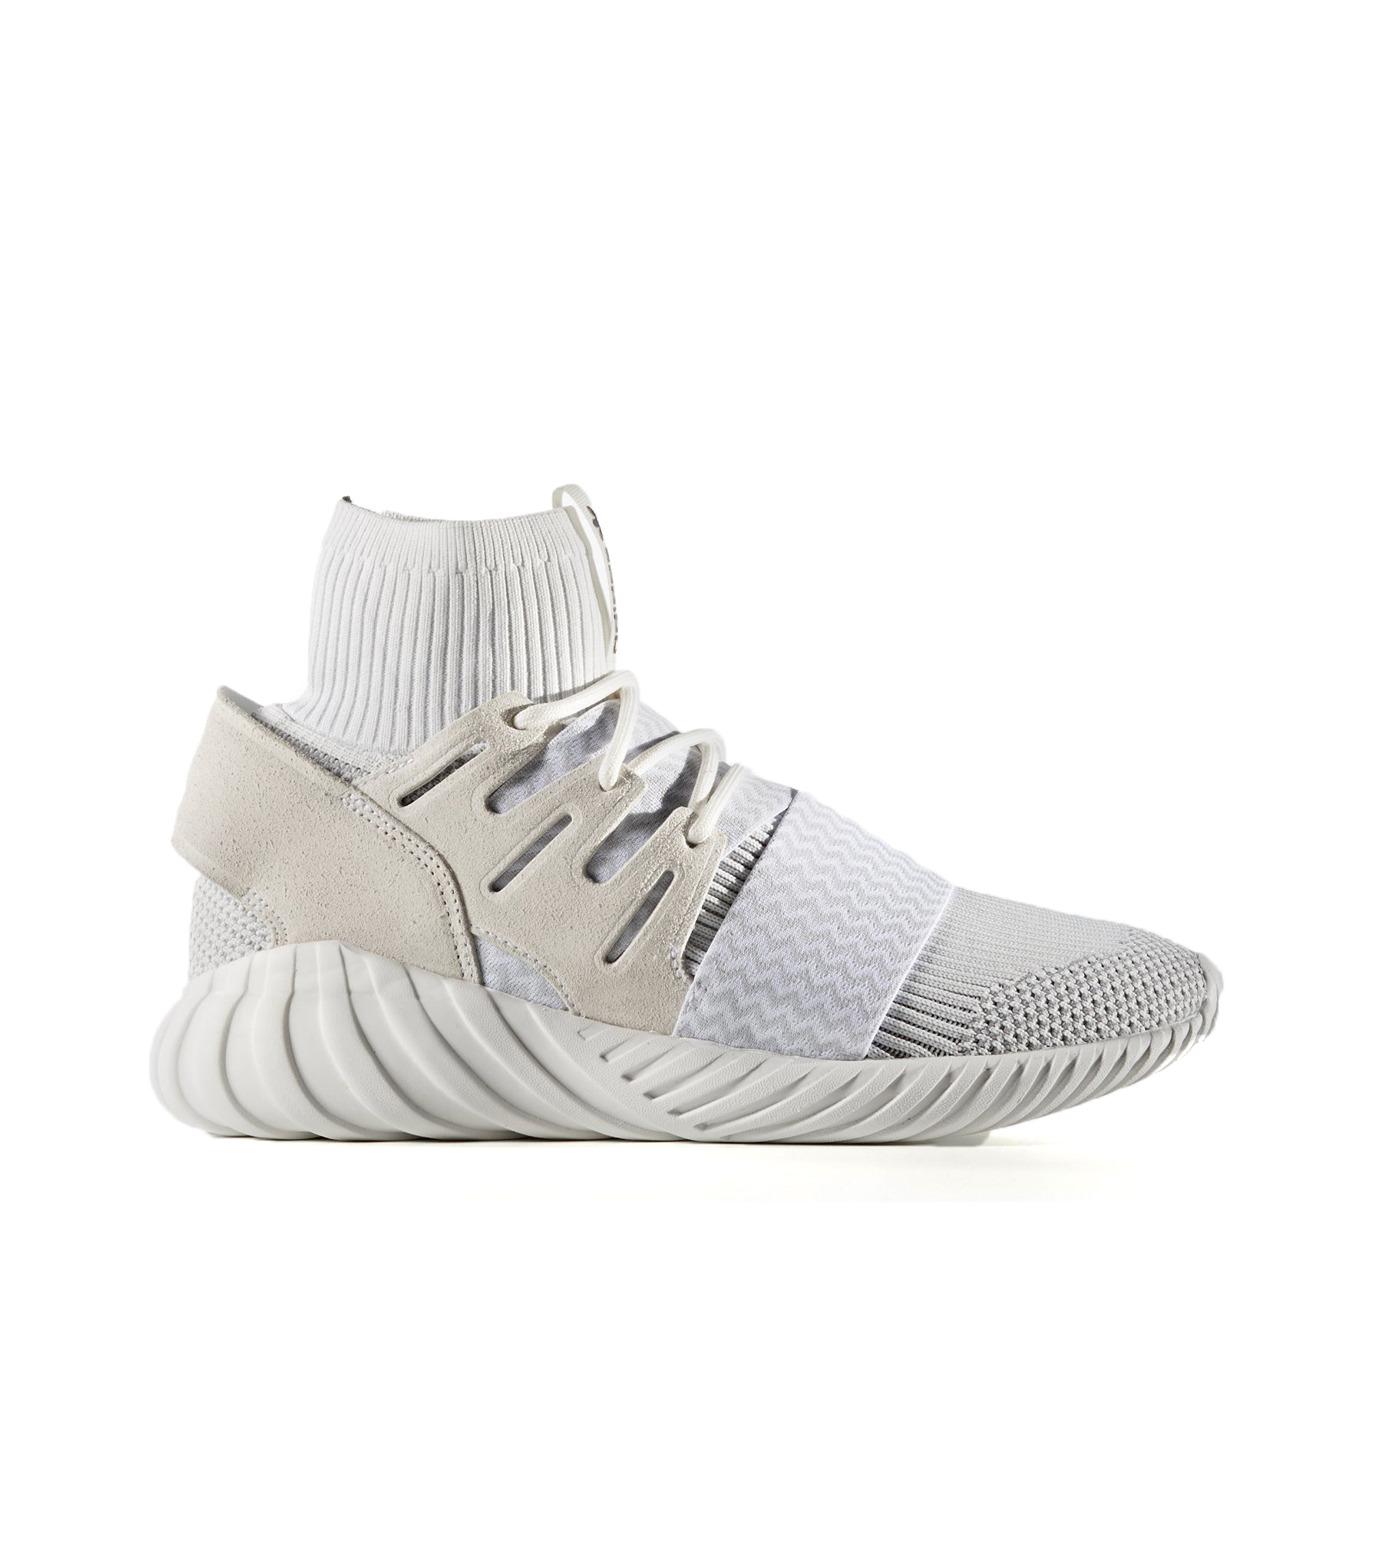 adidas(アディダス)のTUBULAR DOOM PK-WHITE(シューズ/shoes)-S80509-4 拡大詳細画像1